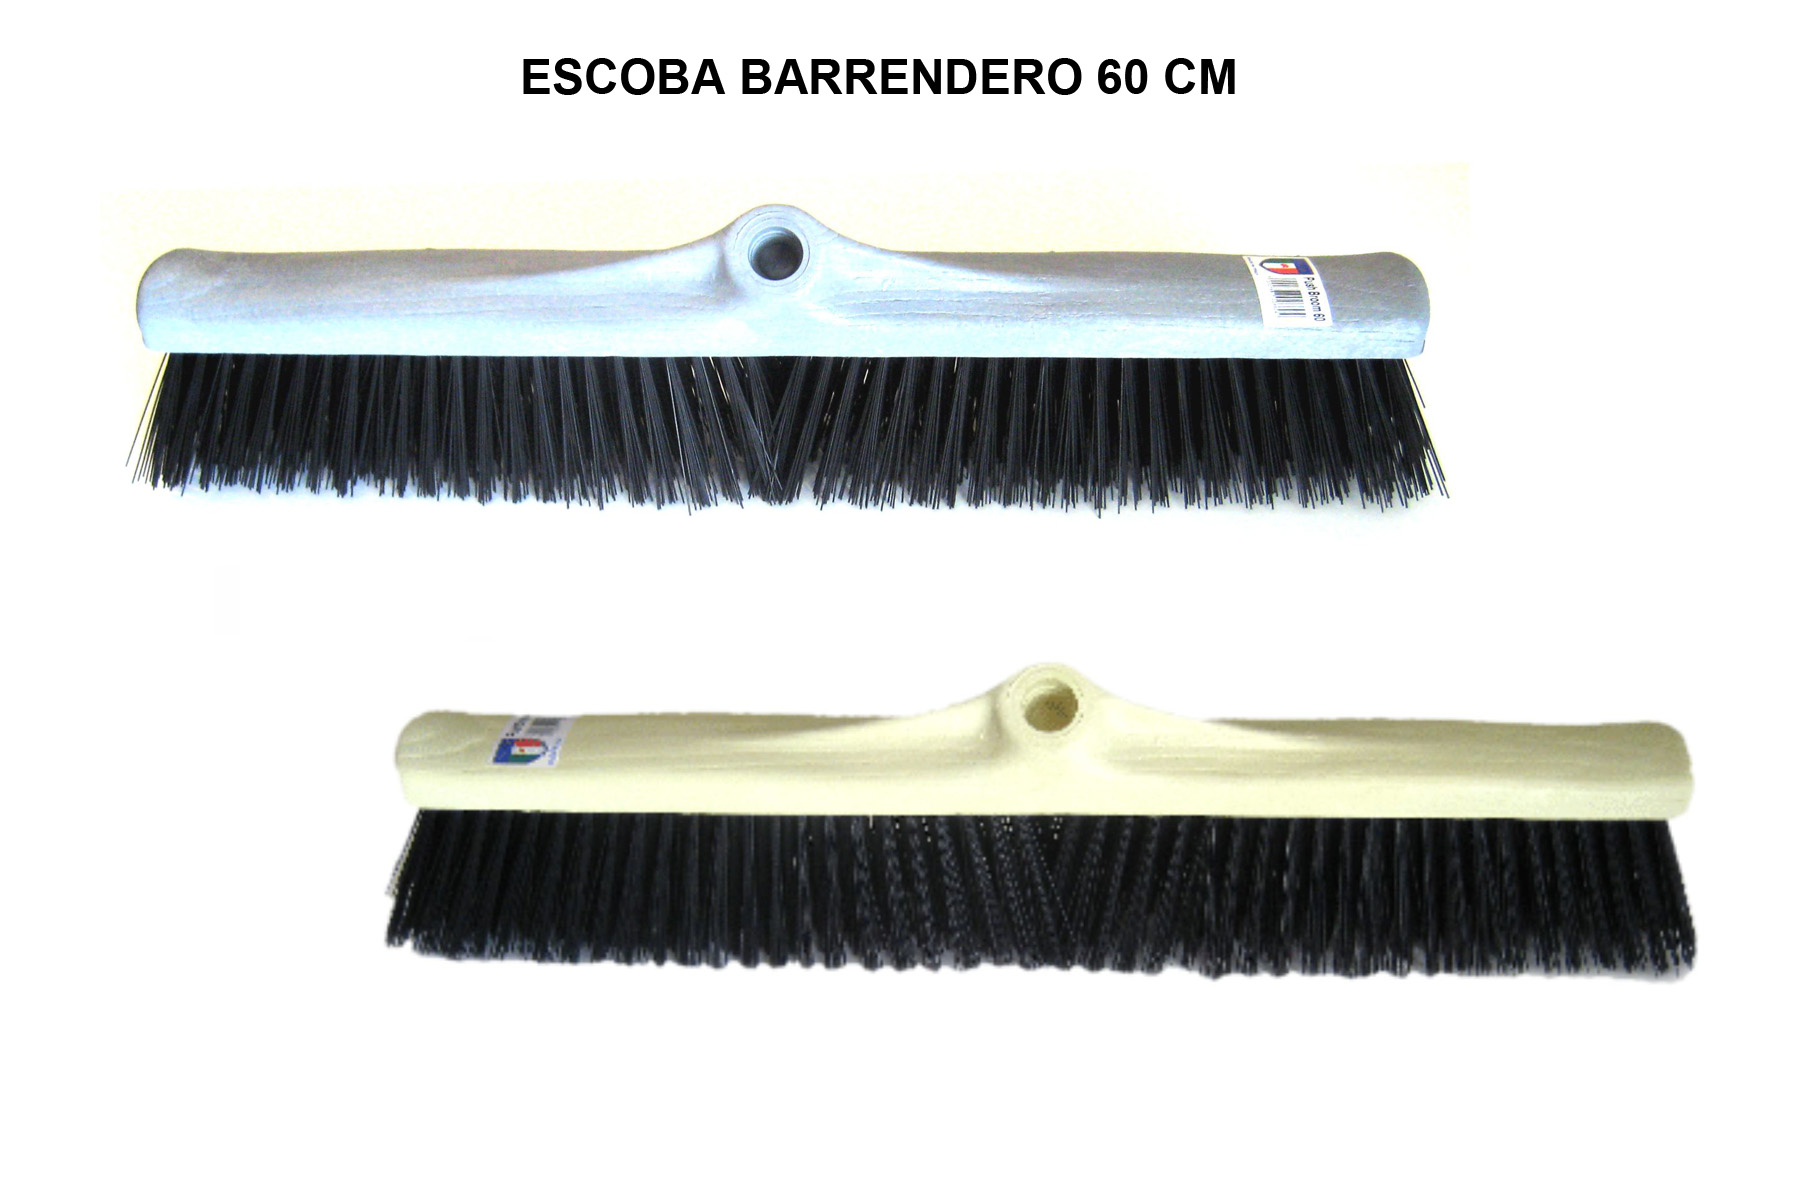 ESCOBA BARRENDERO 60 CM